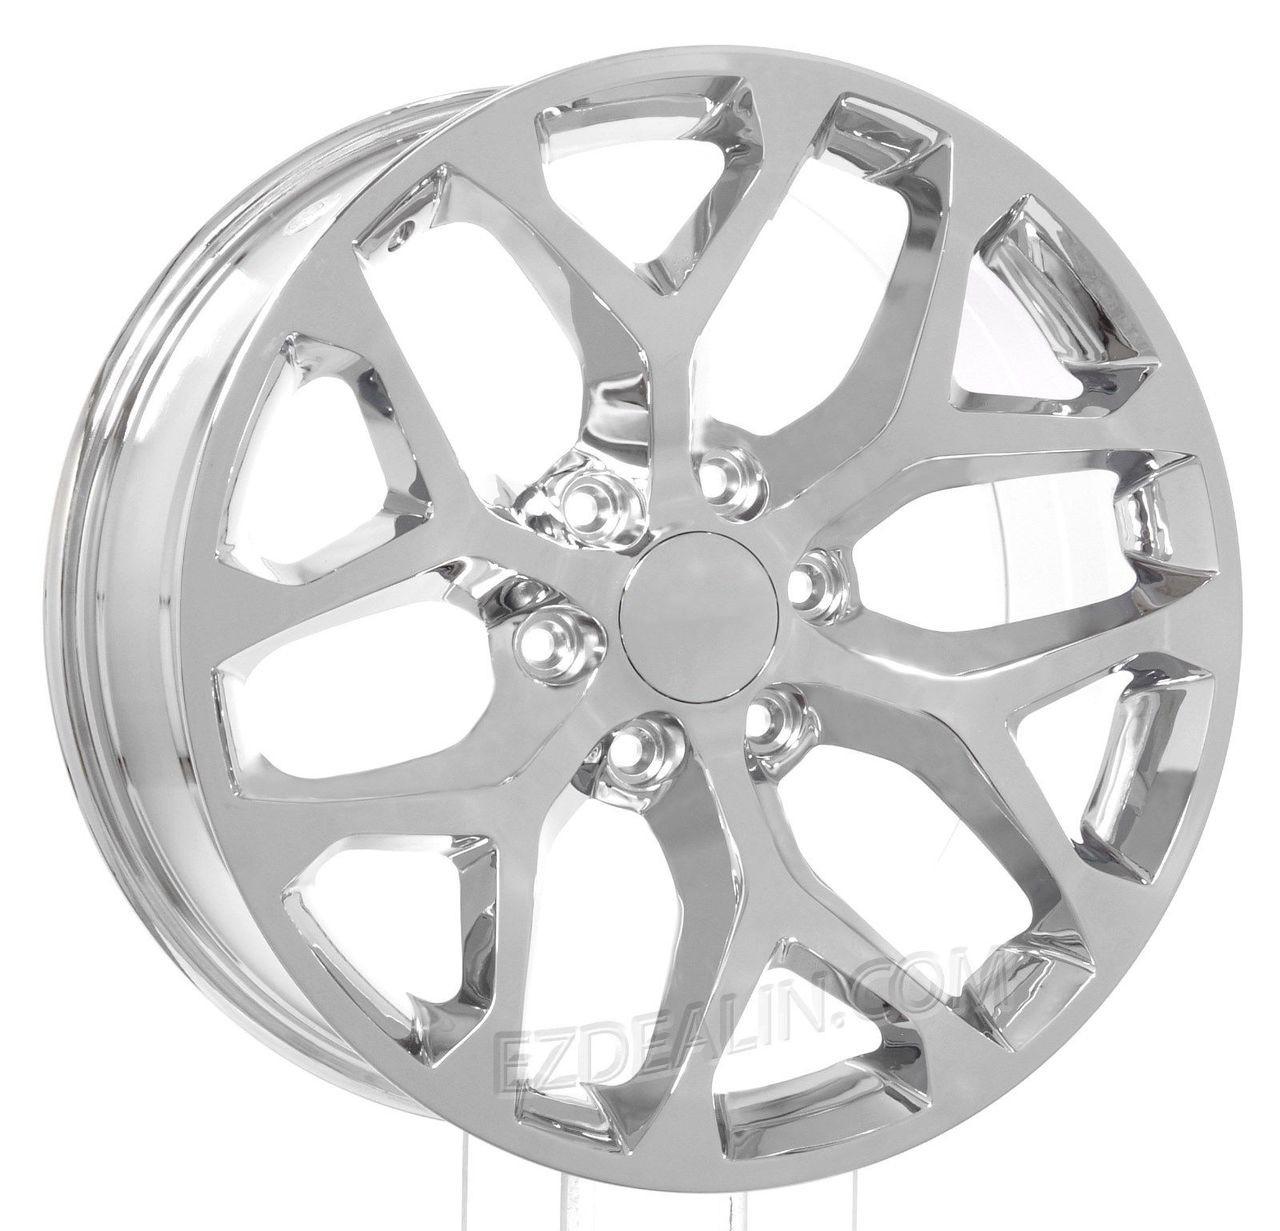 Gmc 20 Chrome Snowflake Wheels For Sierra Yukon Denali